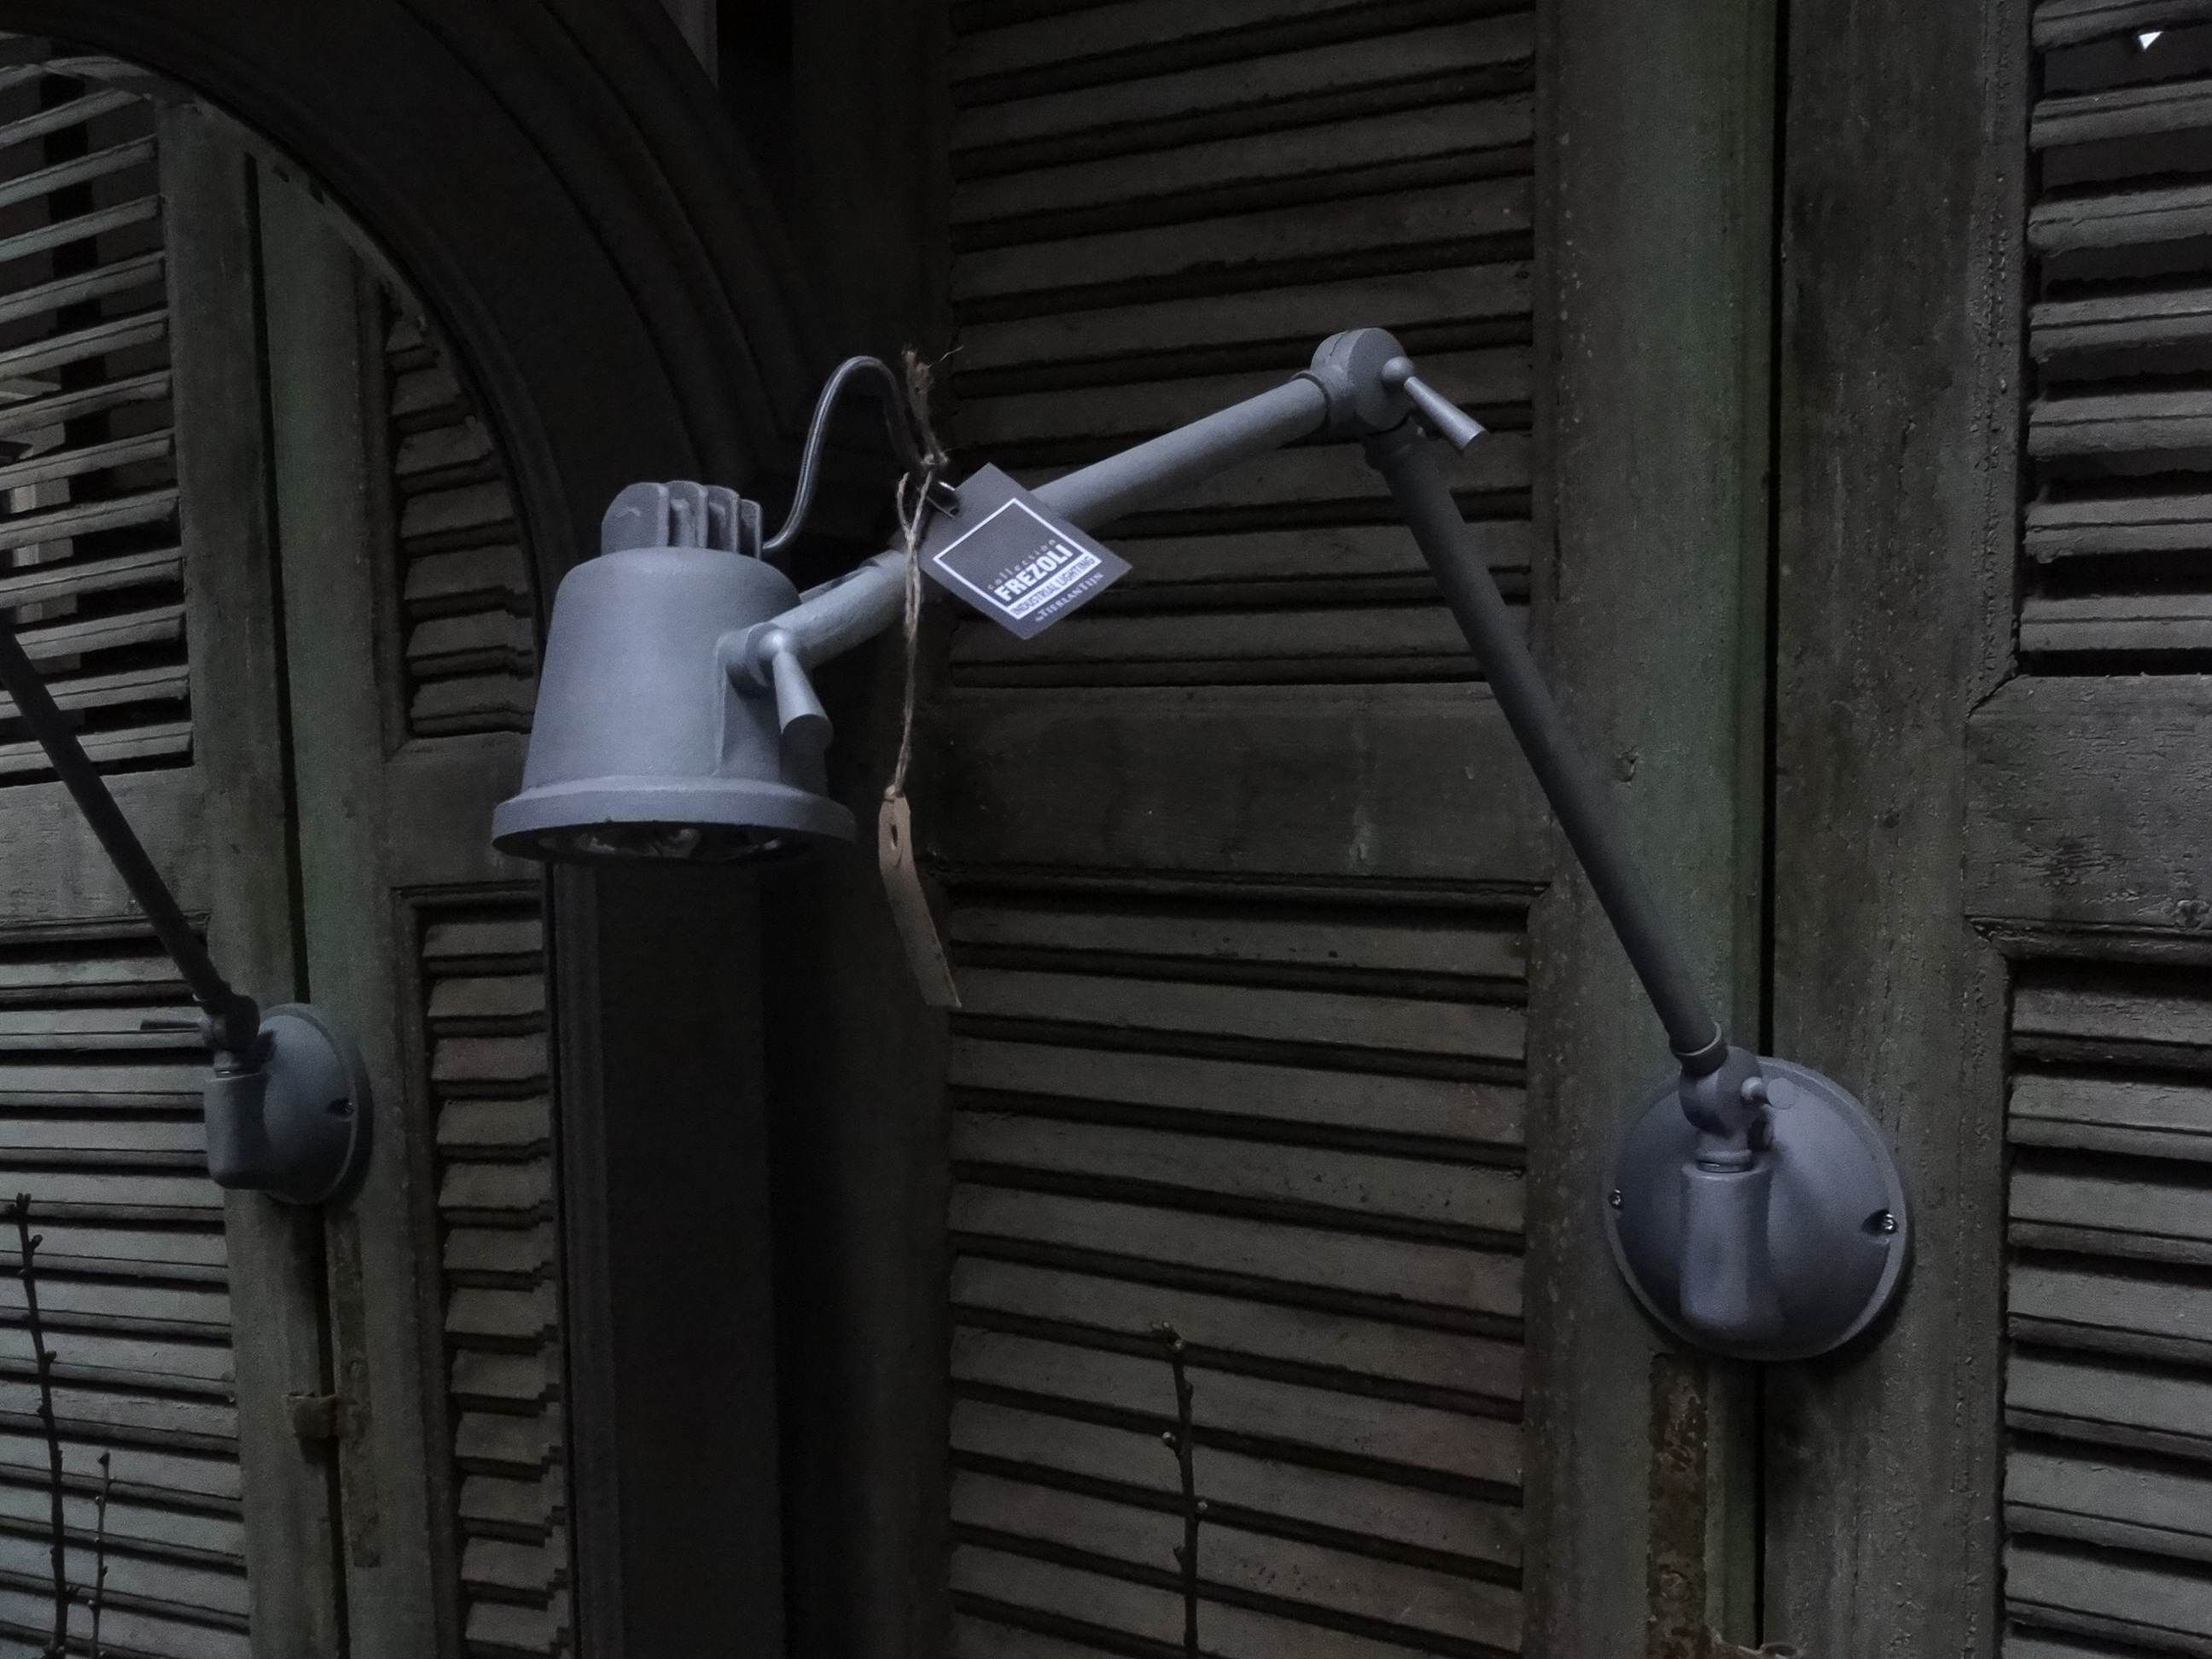 Wandlamp Frezoli Nr 1489 Www Soberenstoerwonen Nl Wandlamp Lampen Verlichting